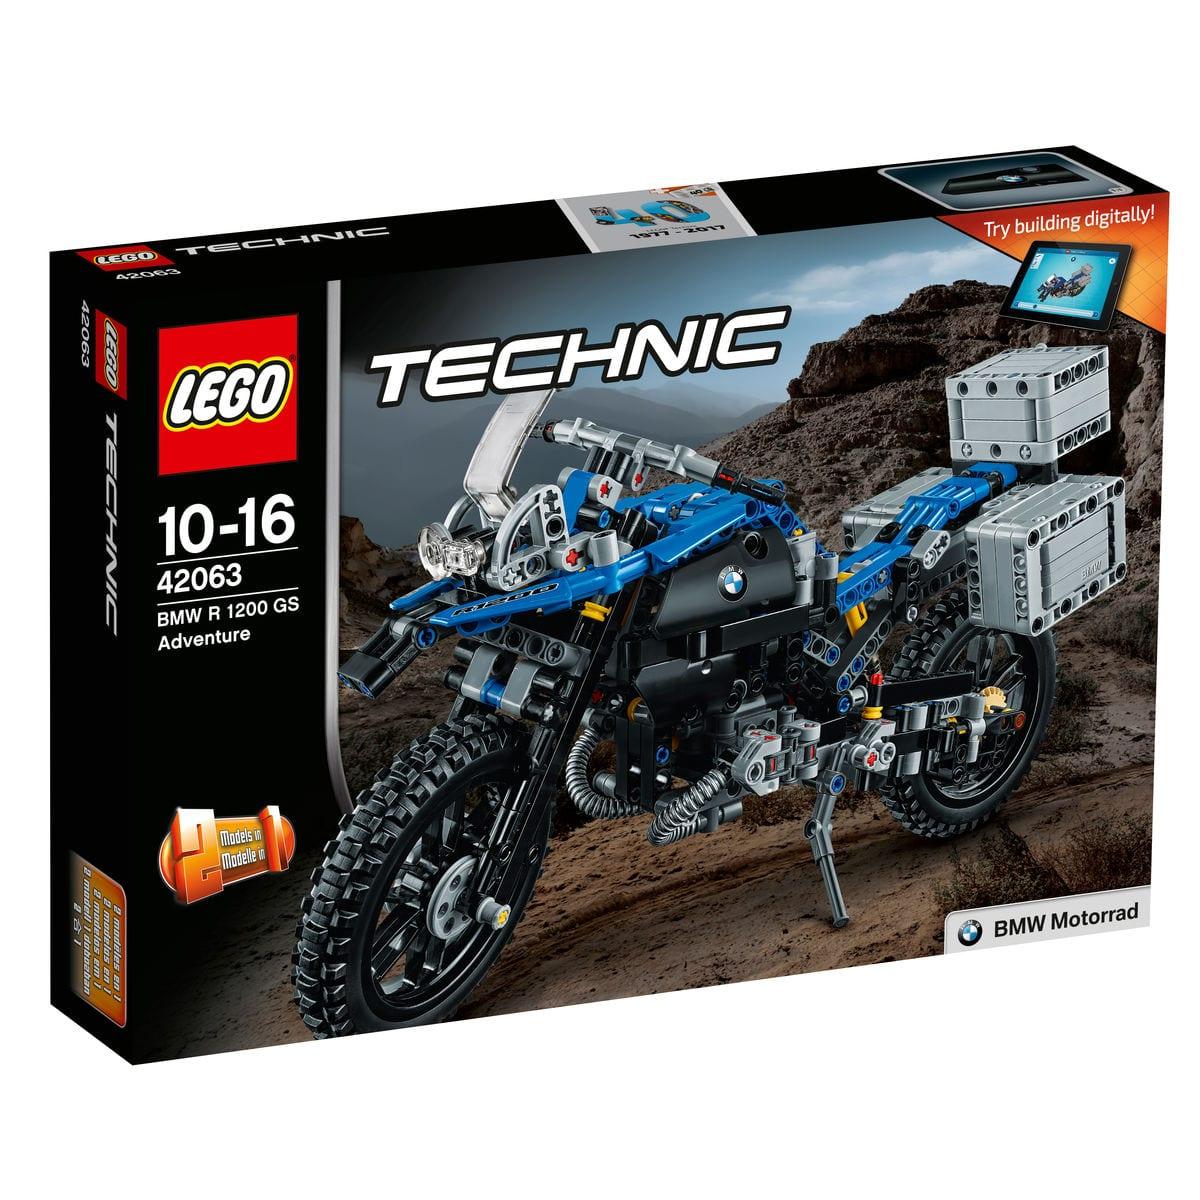 Lego Technic BMW R 1200 GS Adventure 42063